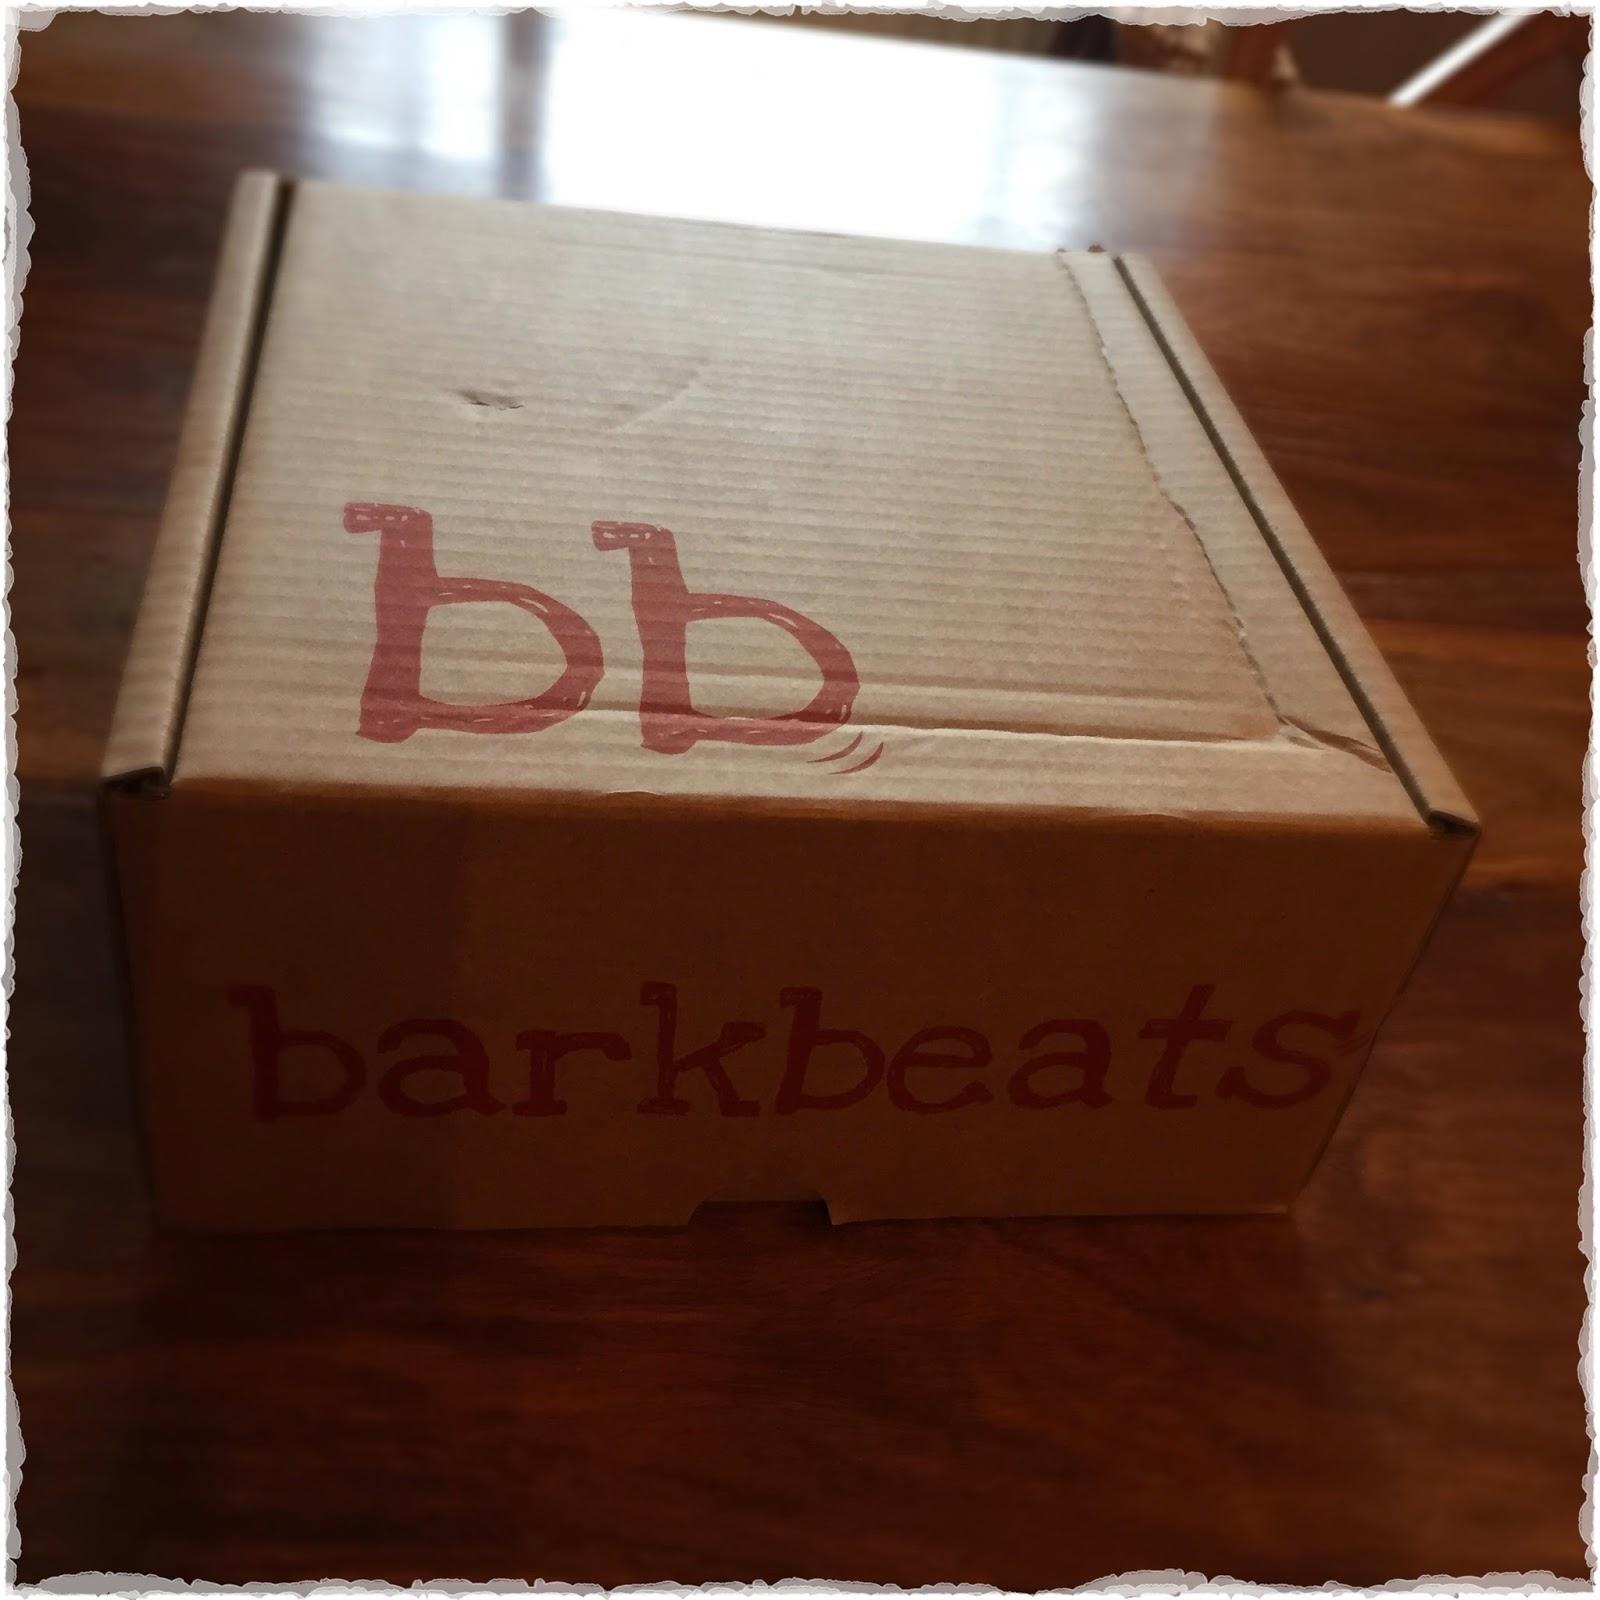 Photo of barkbeats box